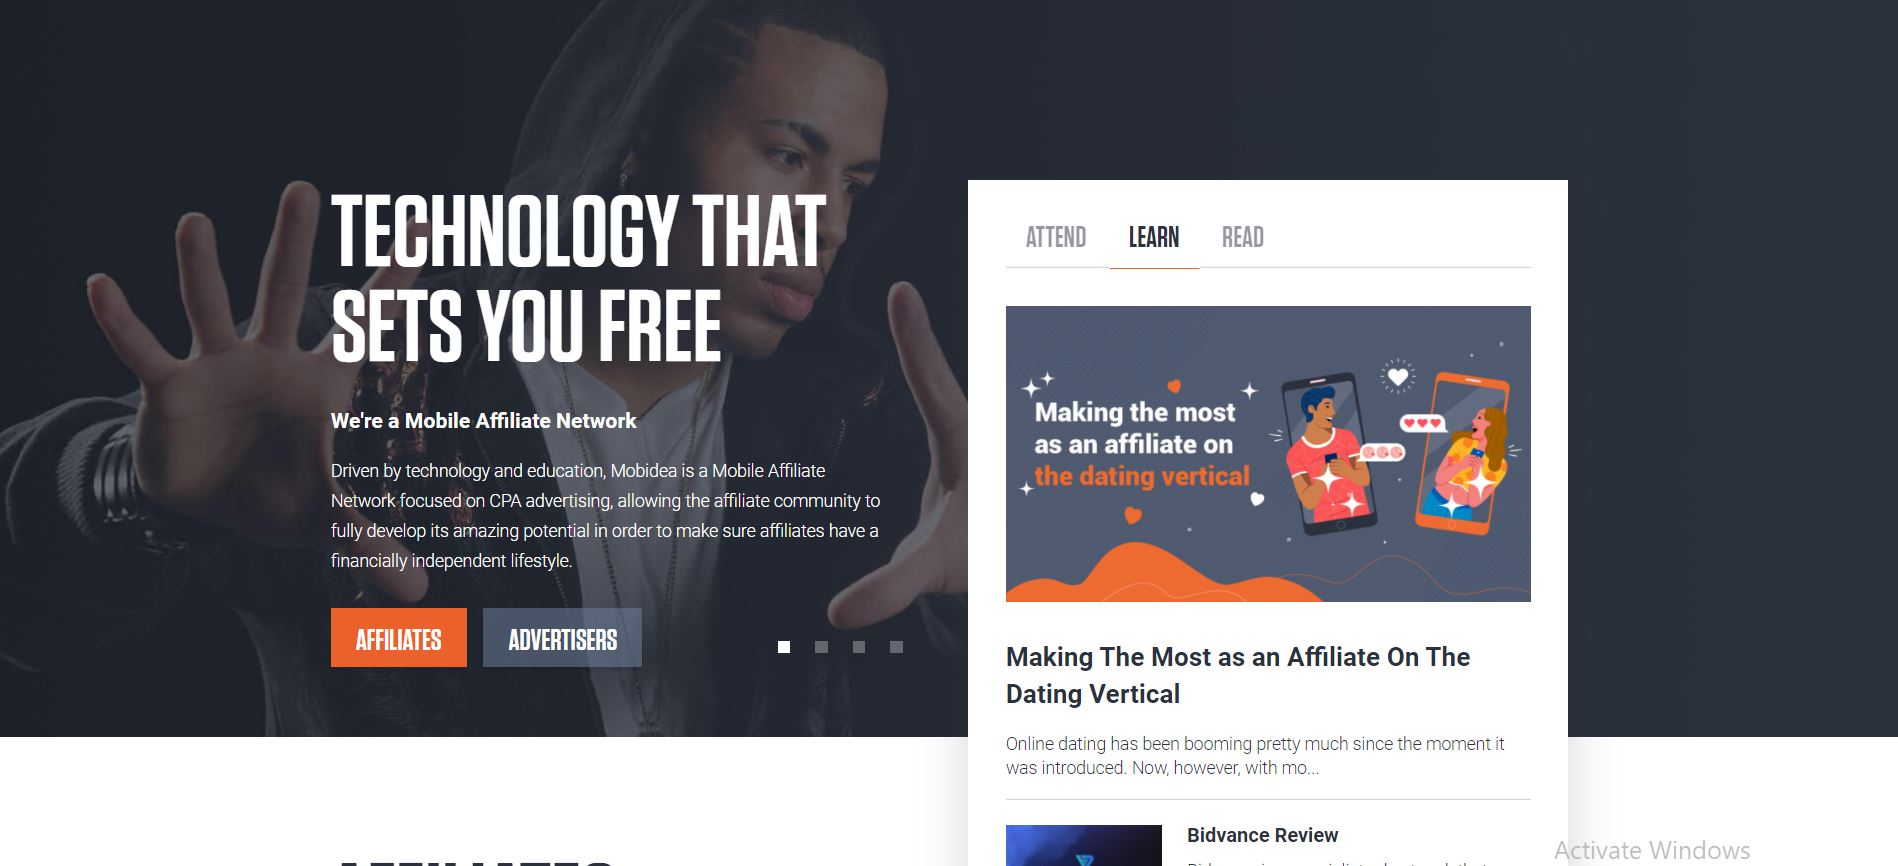 CPA Marketing Network #7. Mobidea